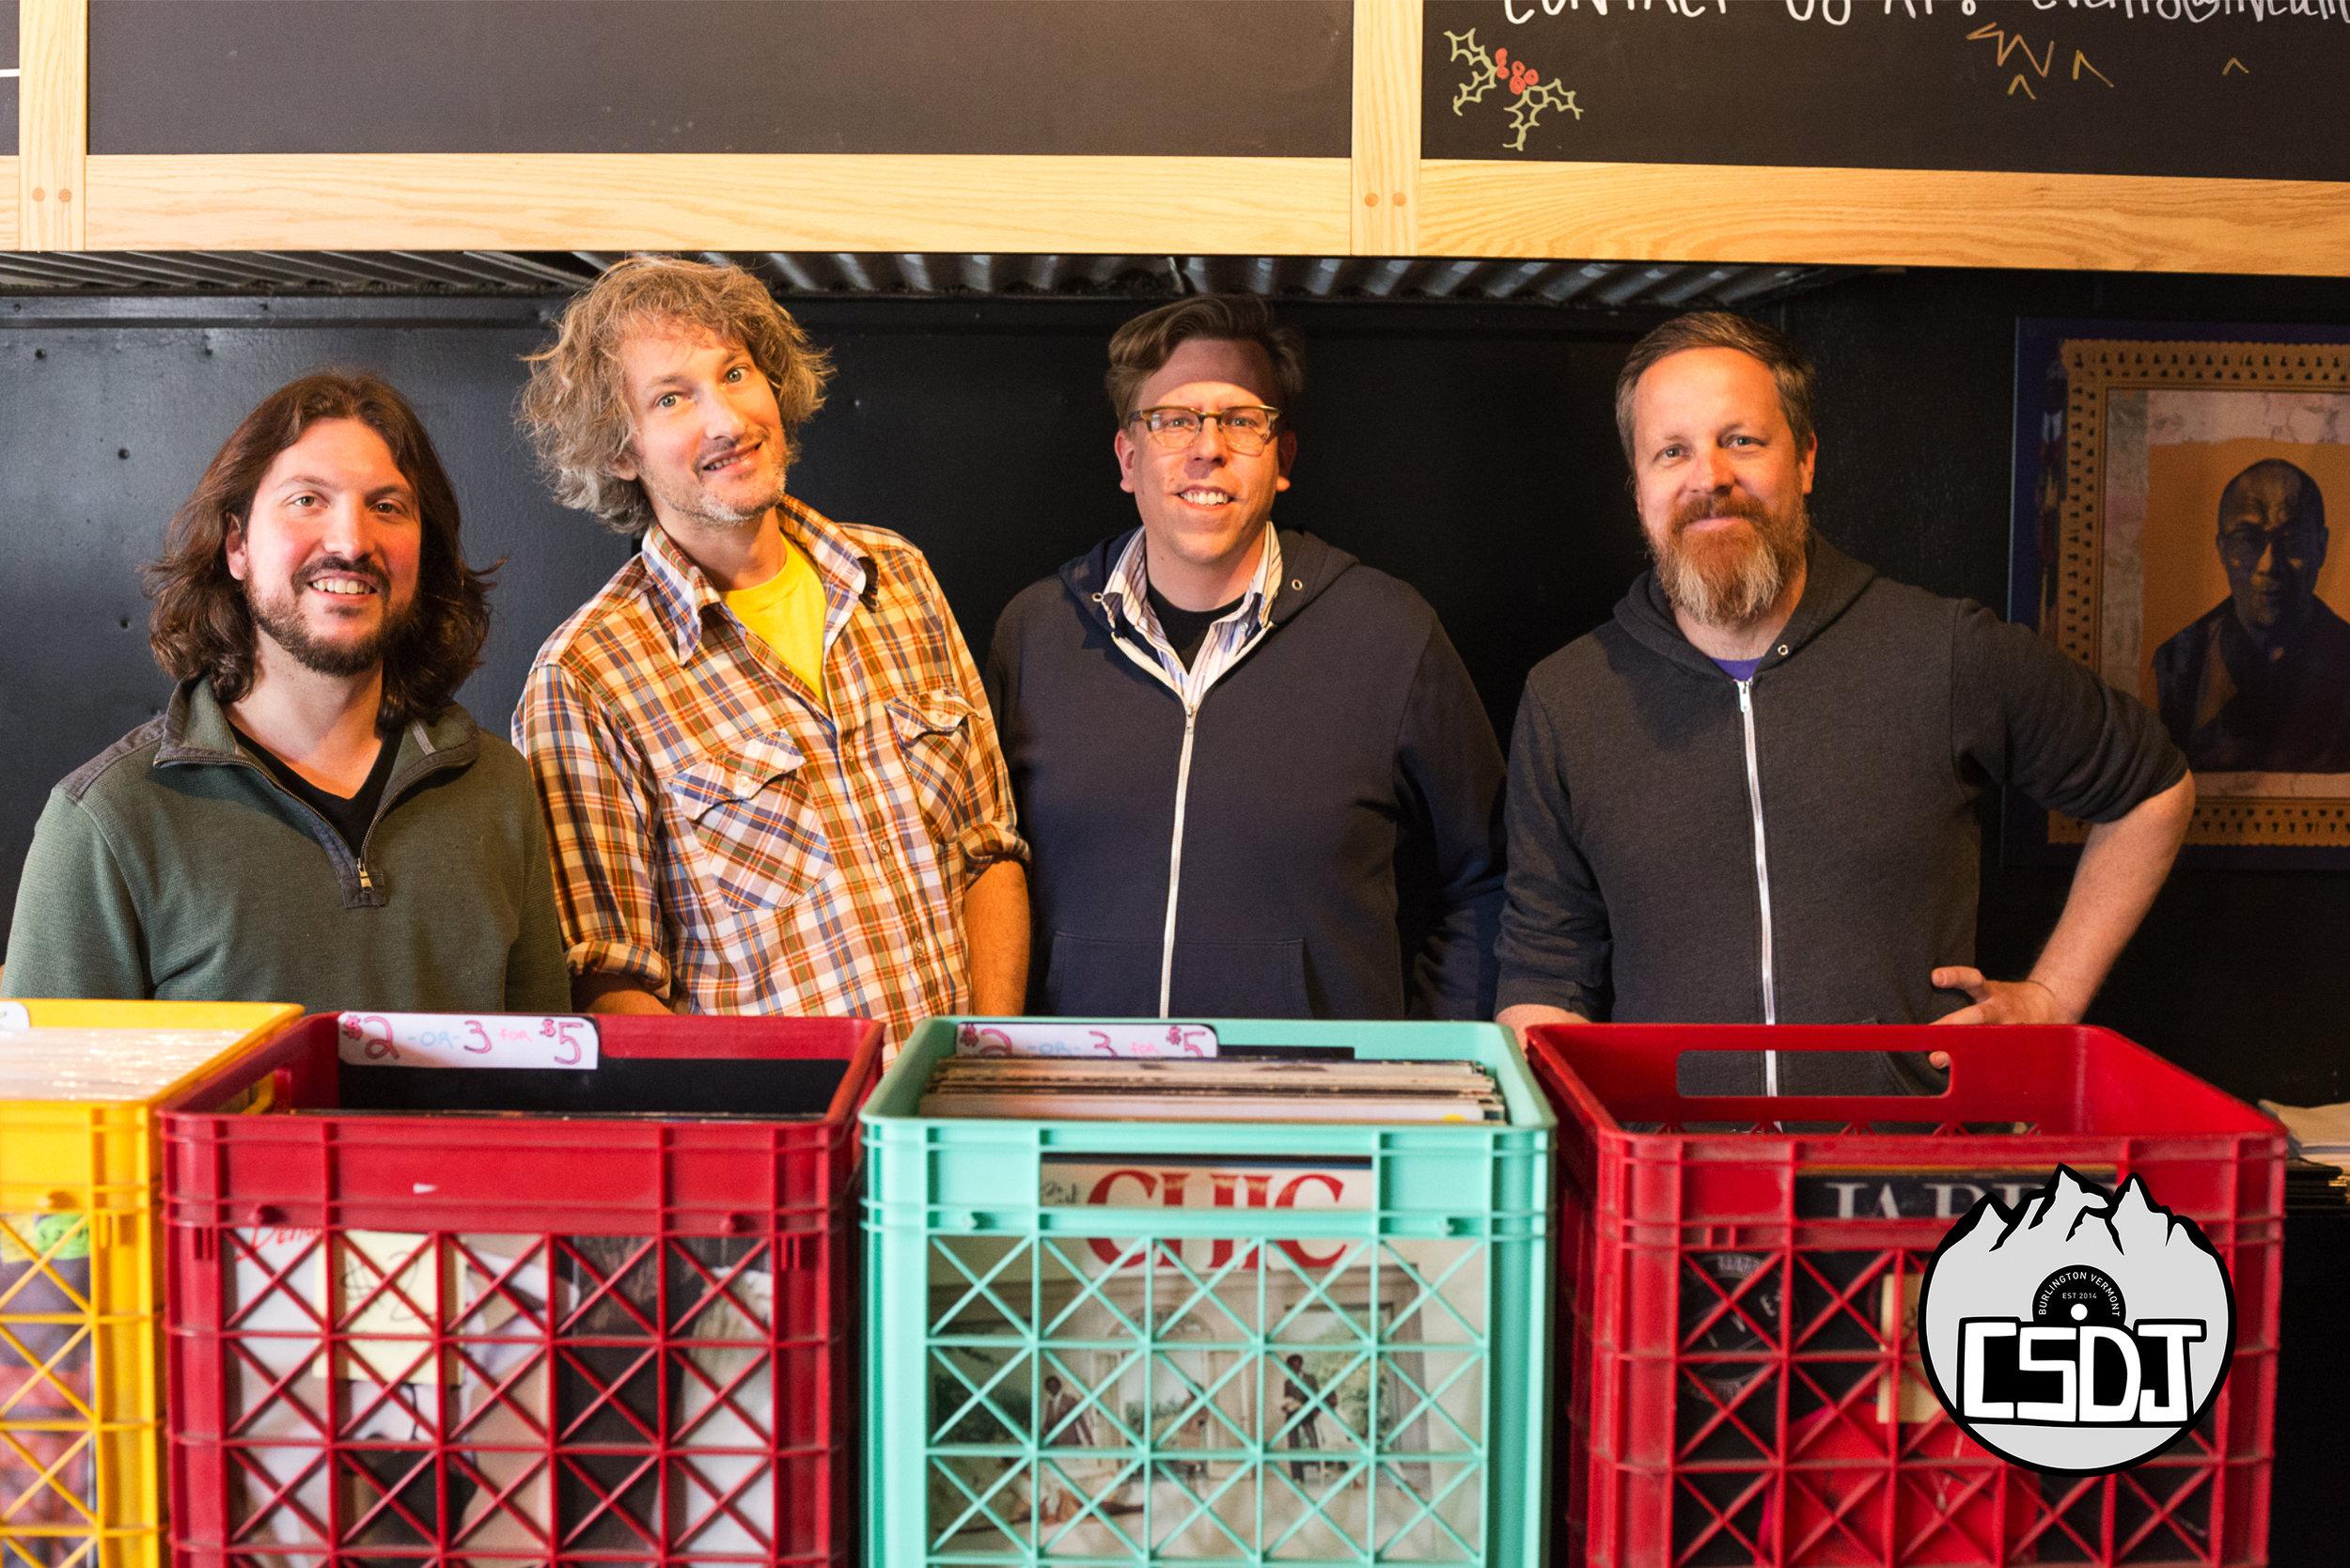 Left to right: Ian Doerner, Evan LeCompte, Matt Kloss and Greg Davis